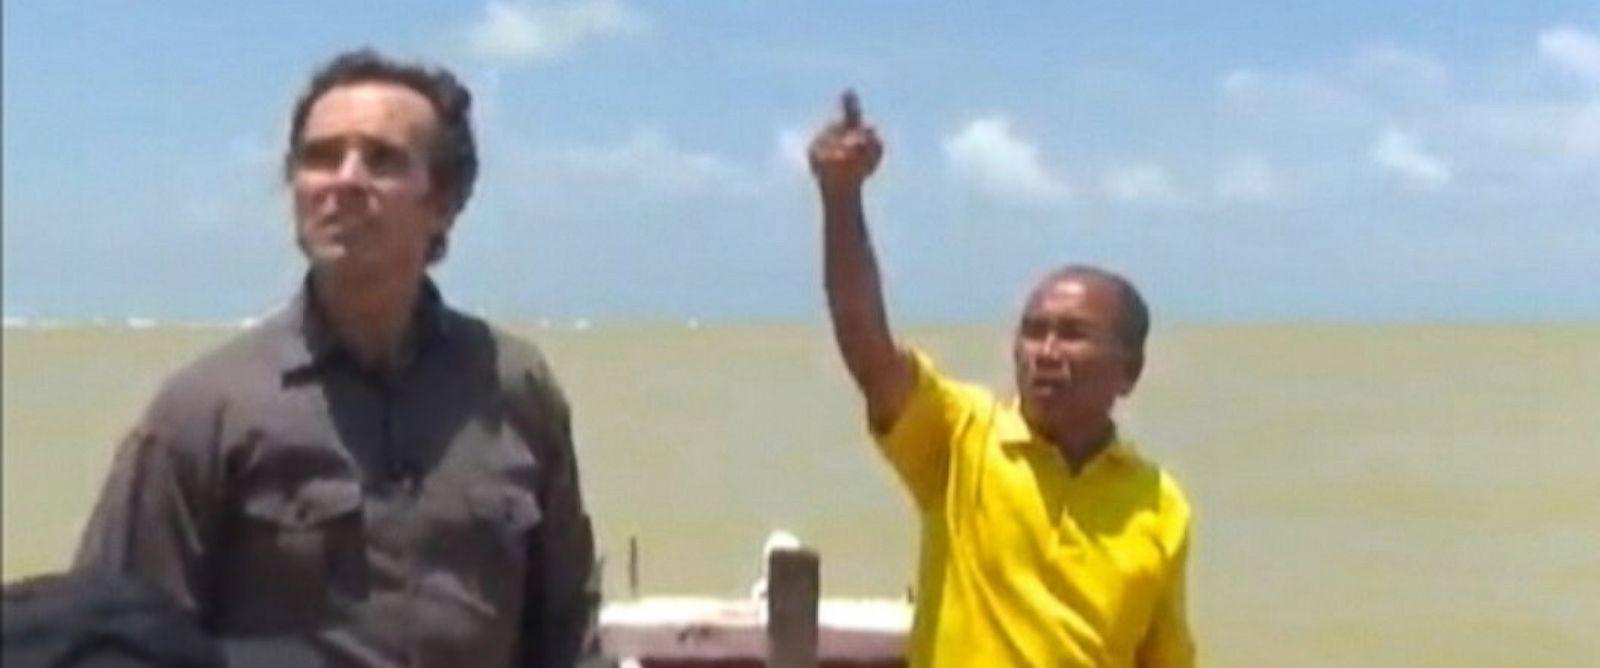 PHOTO: ABC correspondent Bob Woodruff speaks with fisherman in Khota Baru, Malaysia.